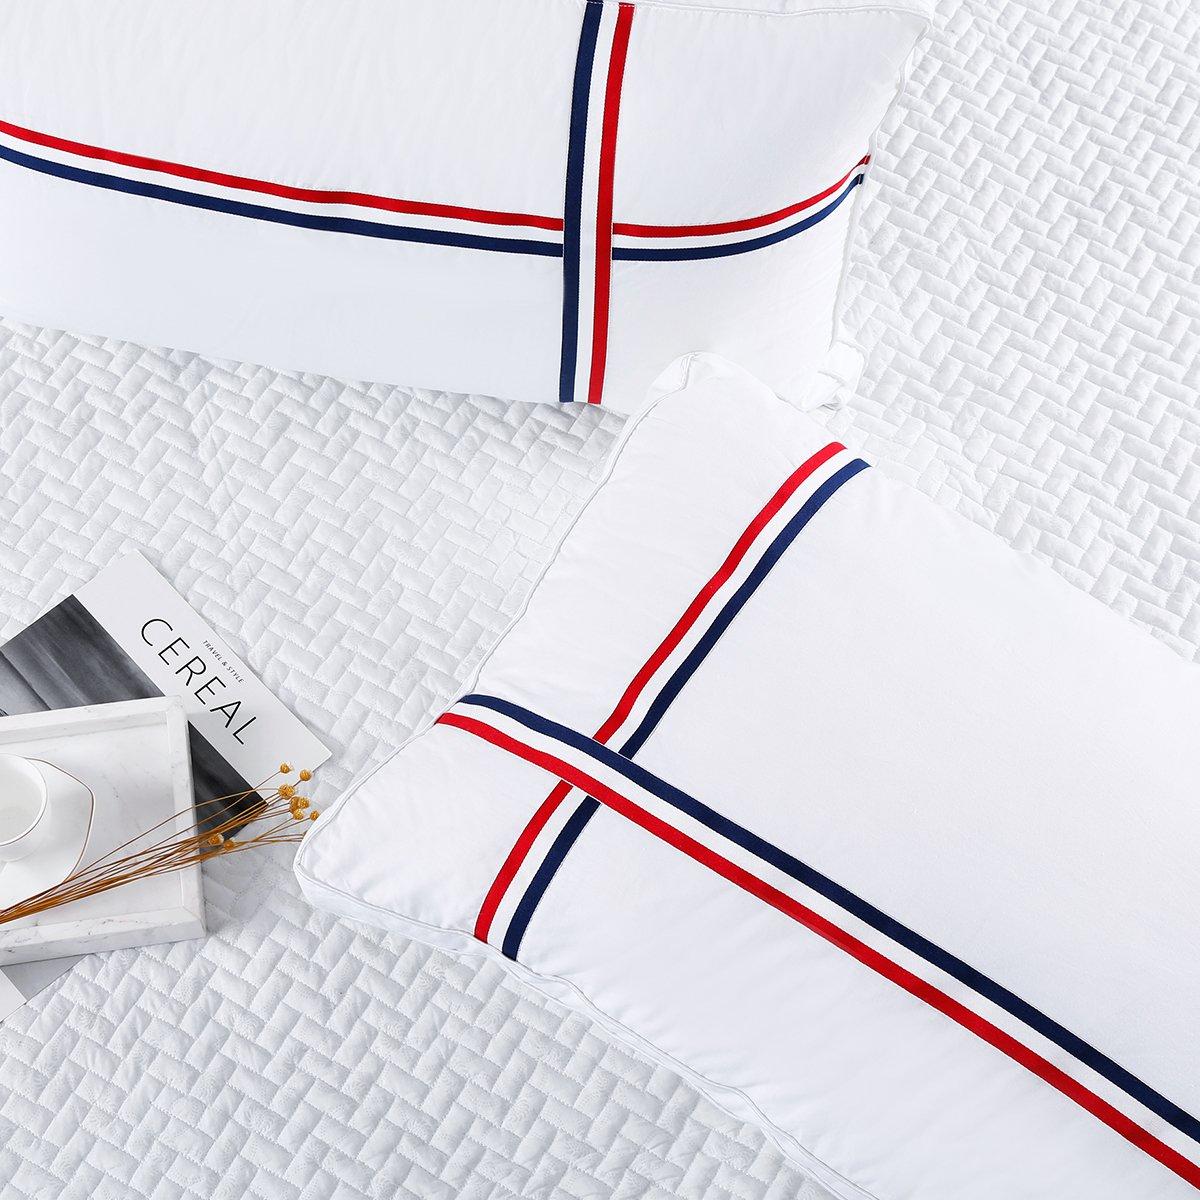 Ramada全棉条纹立体纤维枕羽丝绒枕头芯单个装床上用品全棉枕芯枕头COLOR白色